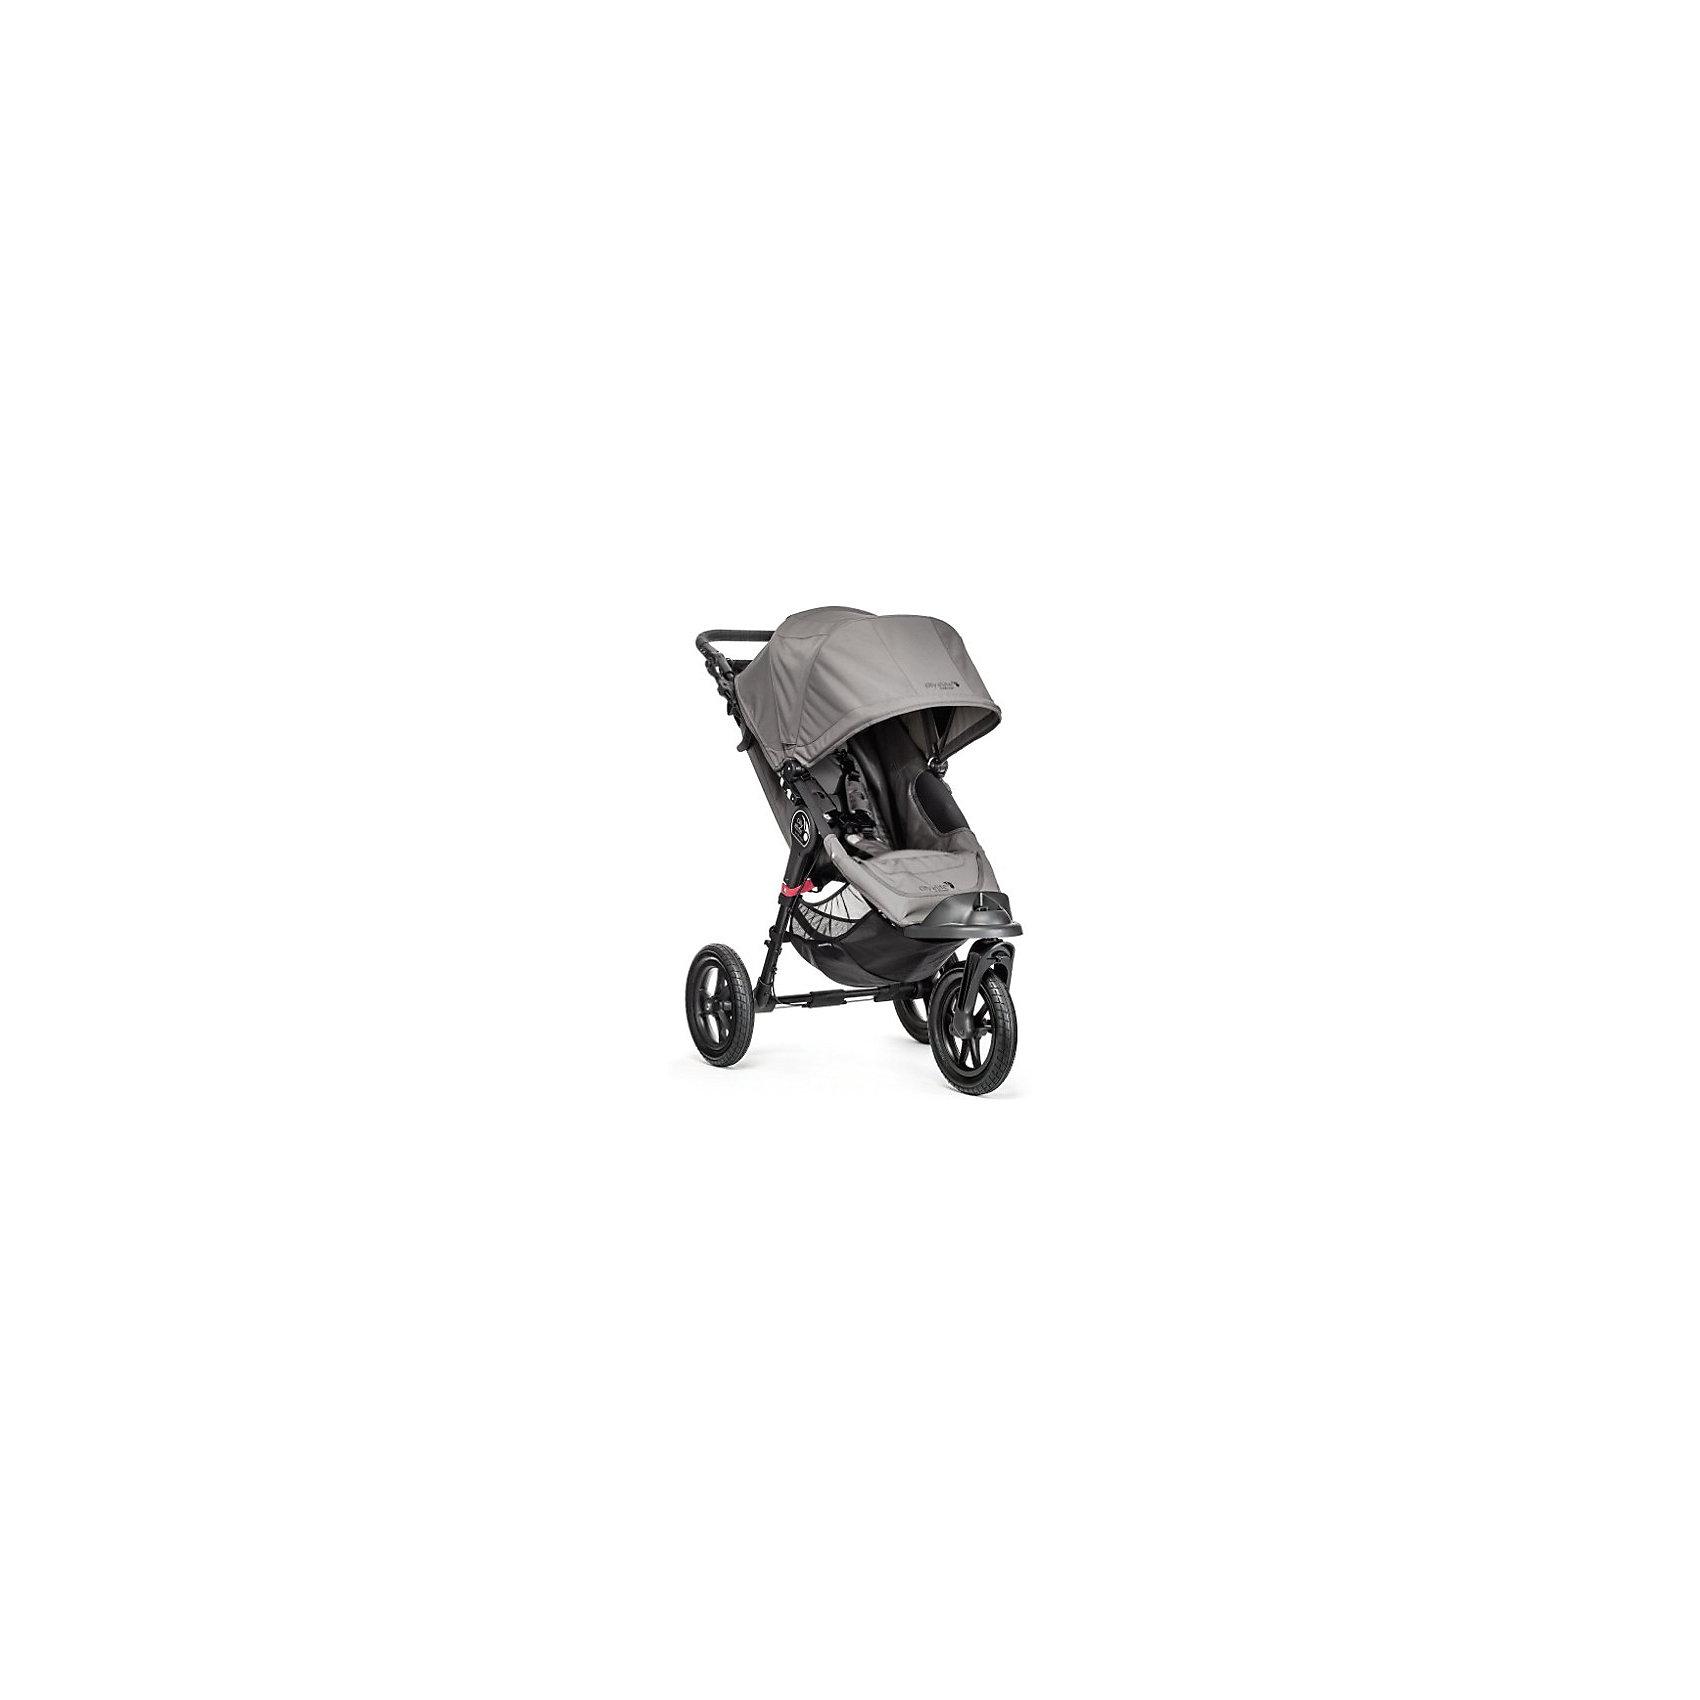 Baby Jogger Прогулочная коляска City Elite Single, Baby Jogger, серый прогулочная коляска cool baby kdd 6699gb t fuchsia light grey